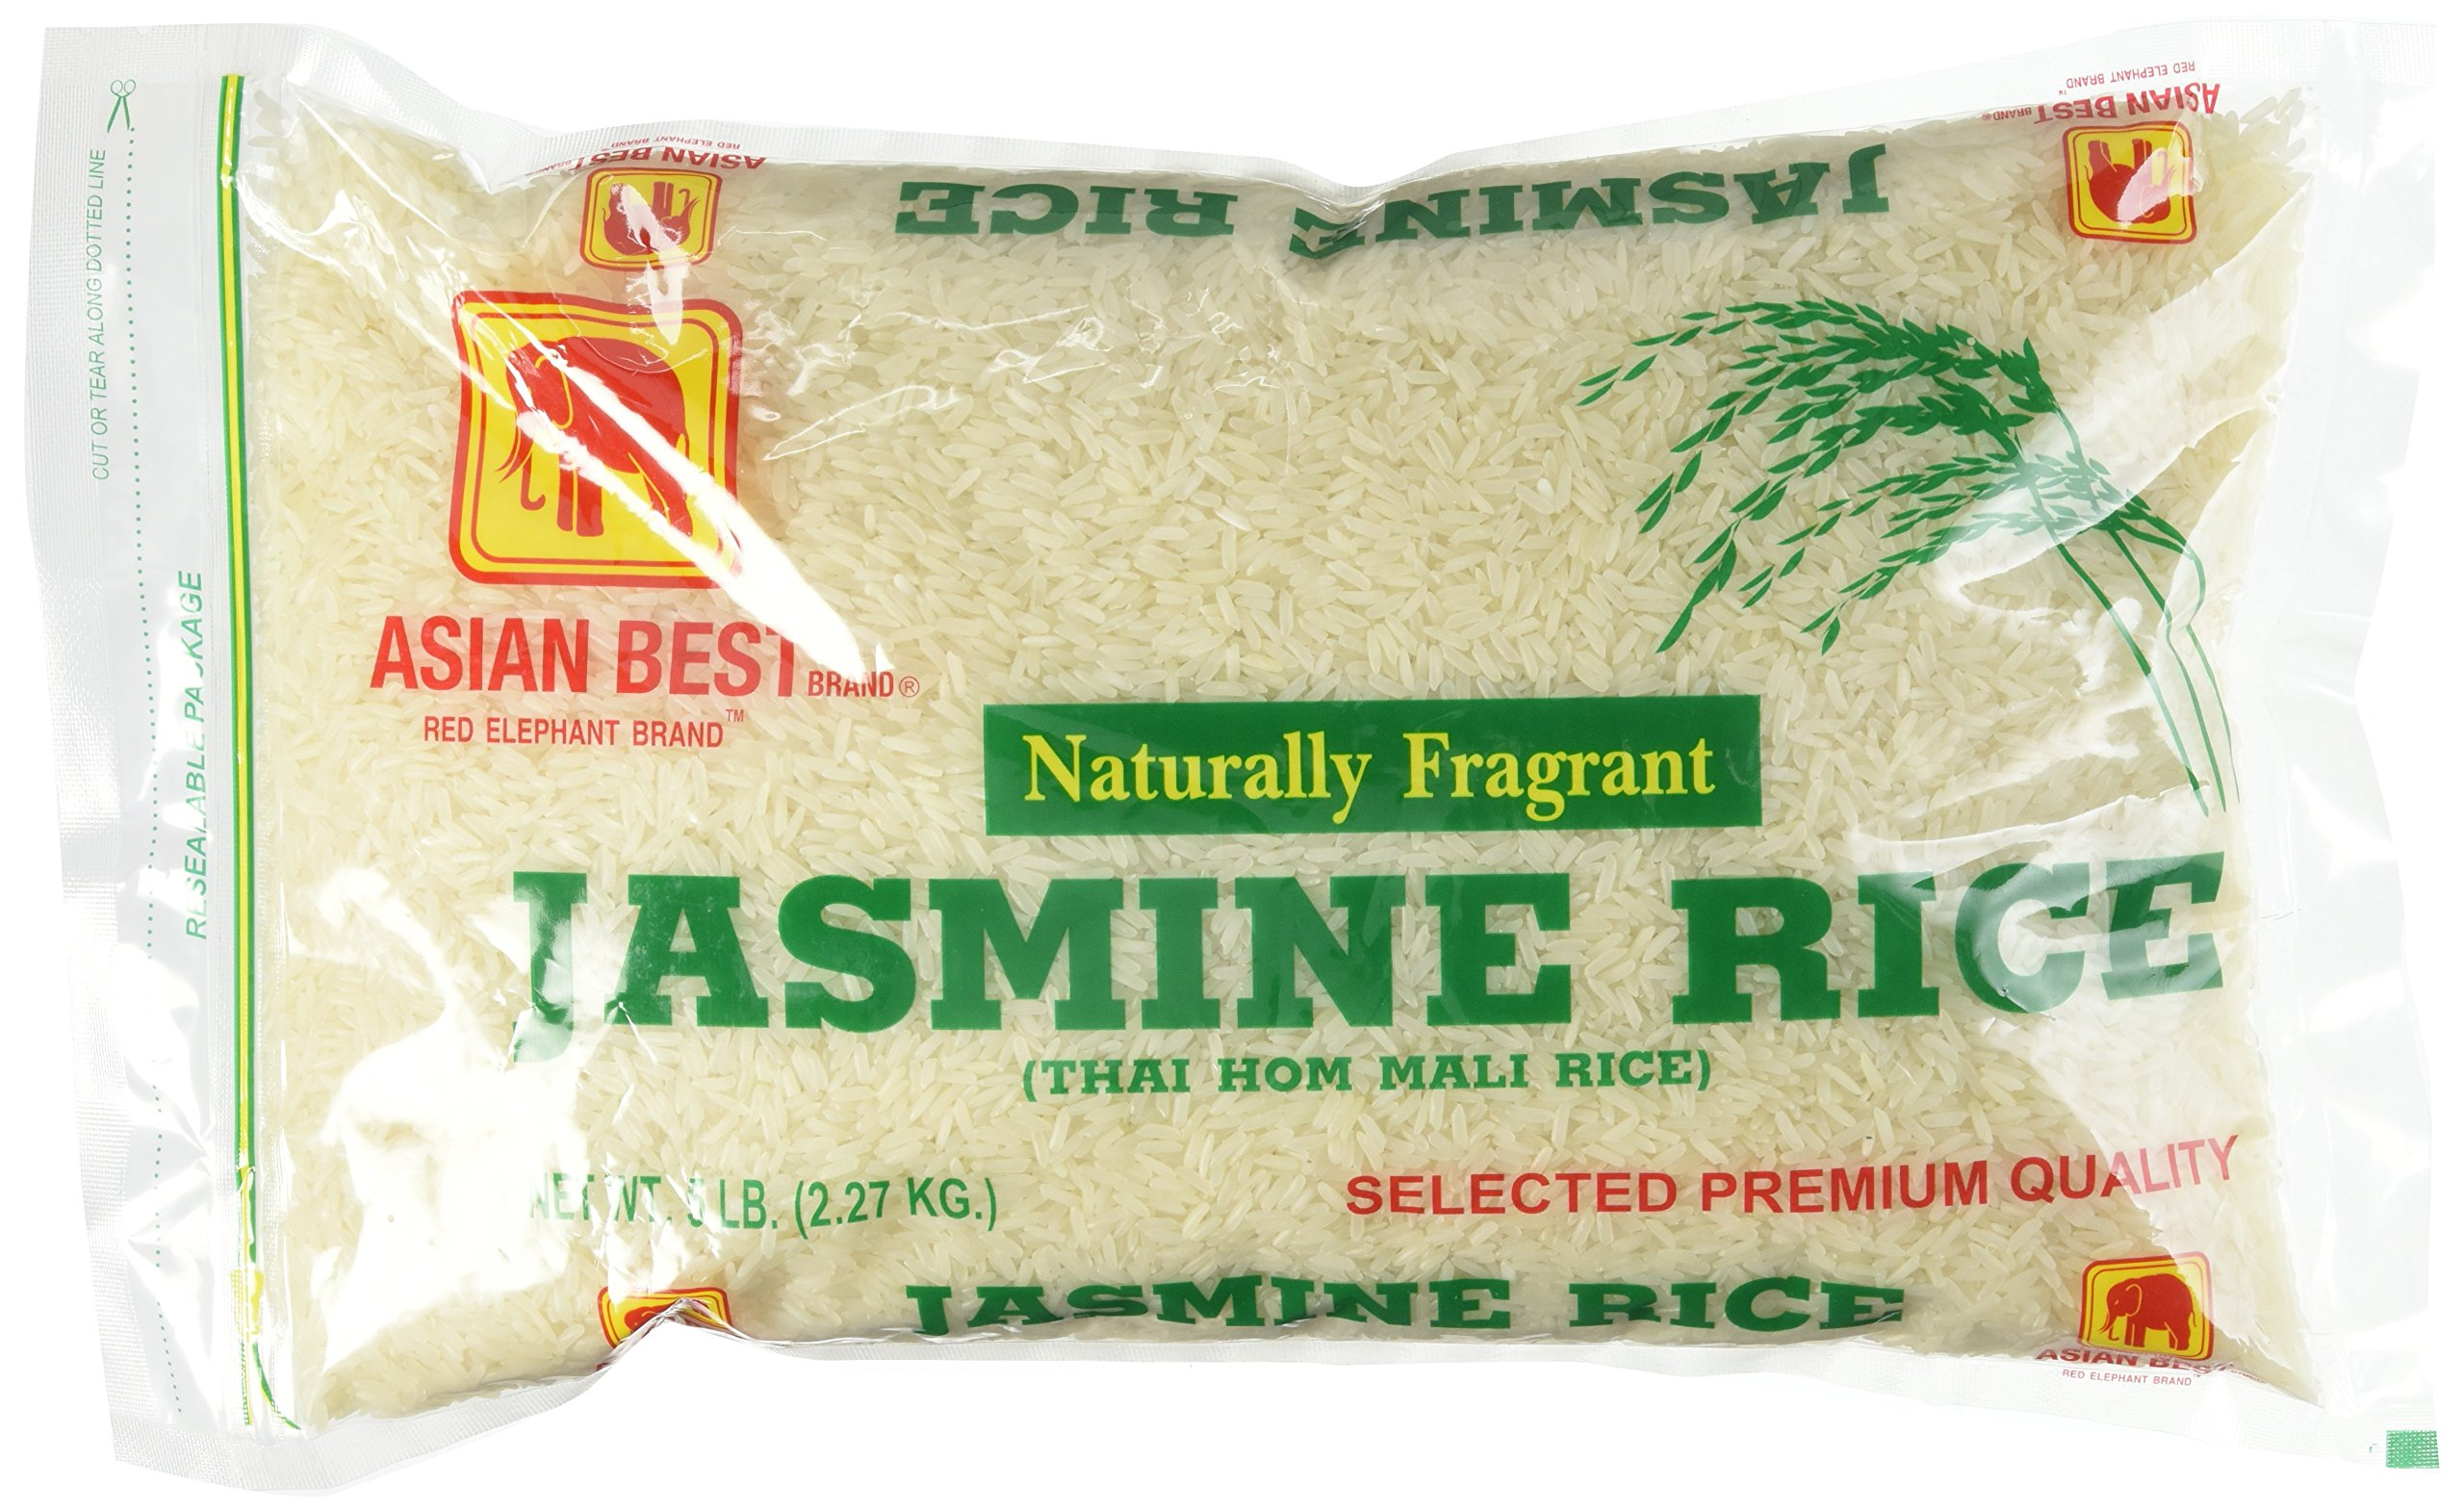 Asian Best Jasmine Rice 5 Pound Buy Online In Lebanon Asian